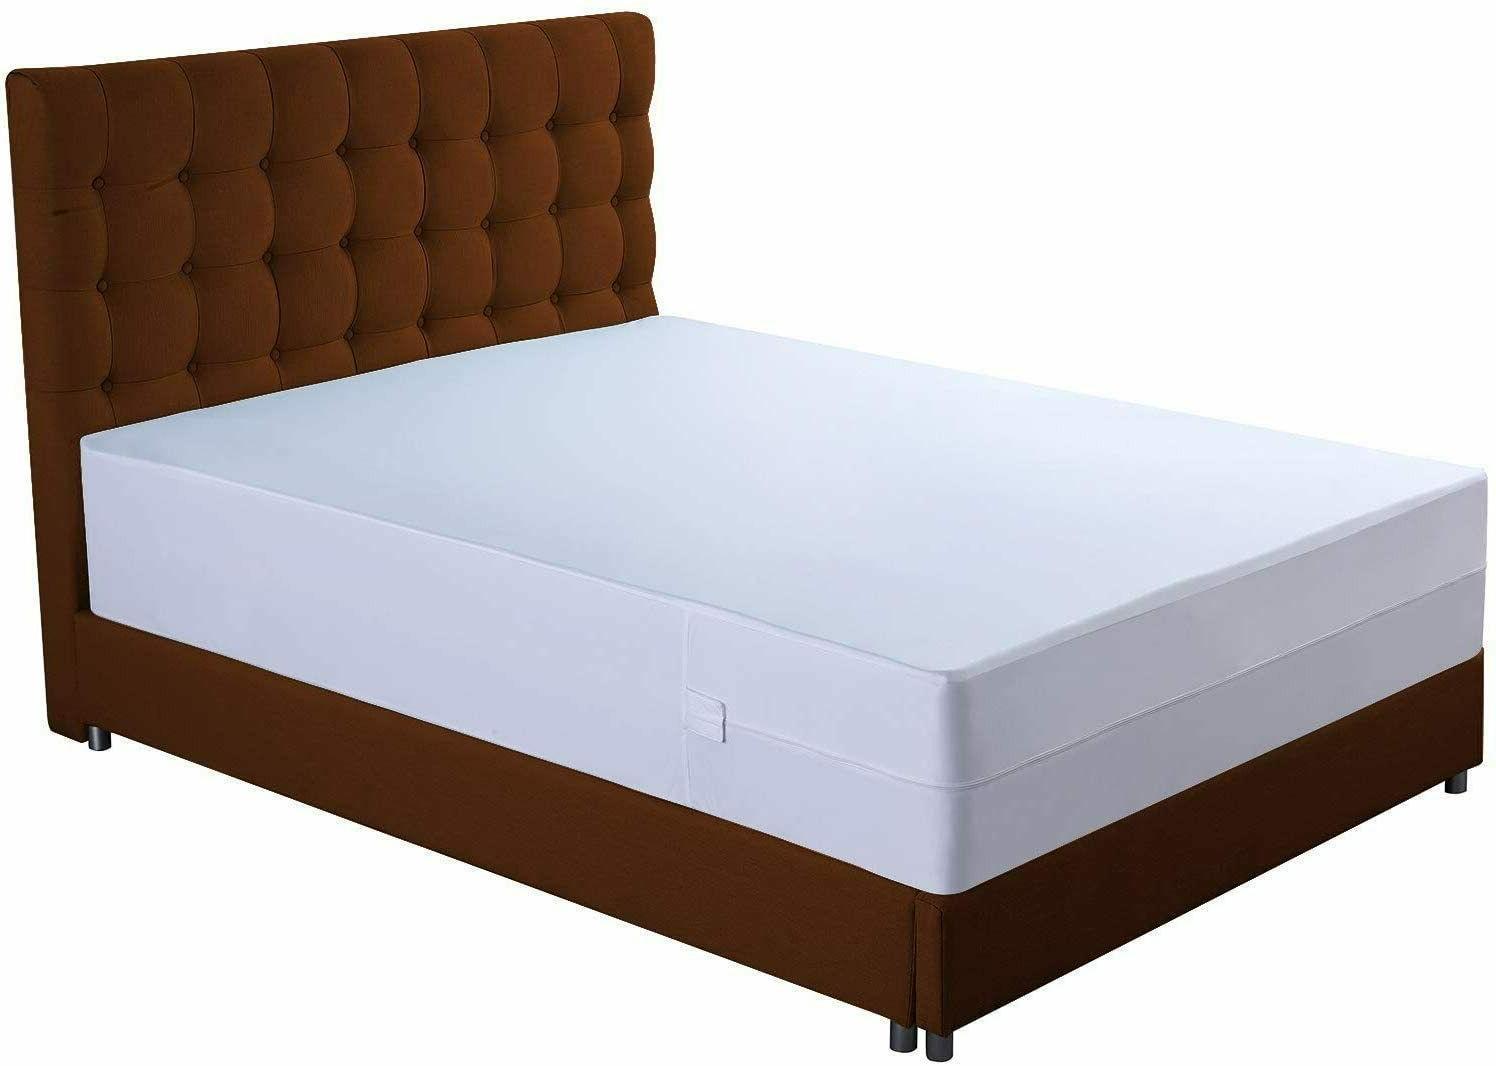 waterproof mattress protector encasement style breathable me